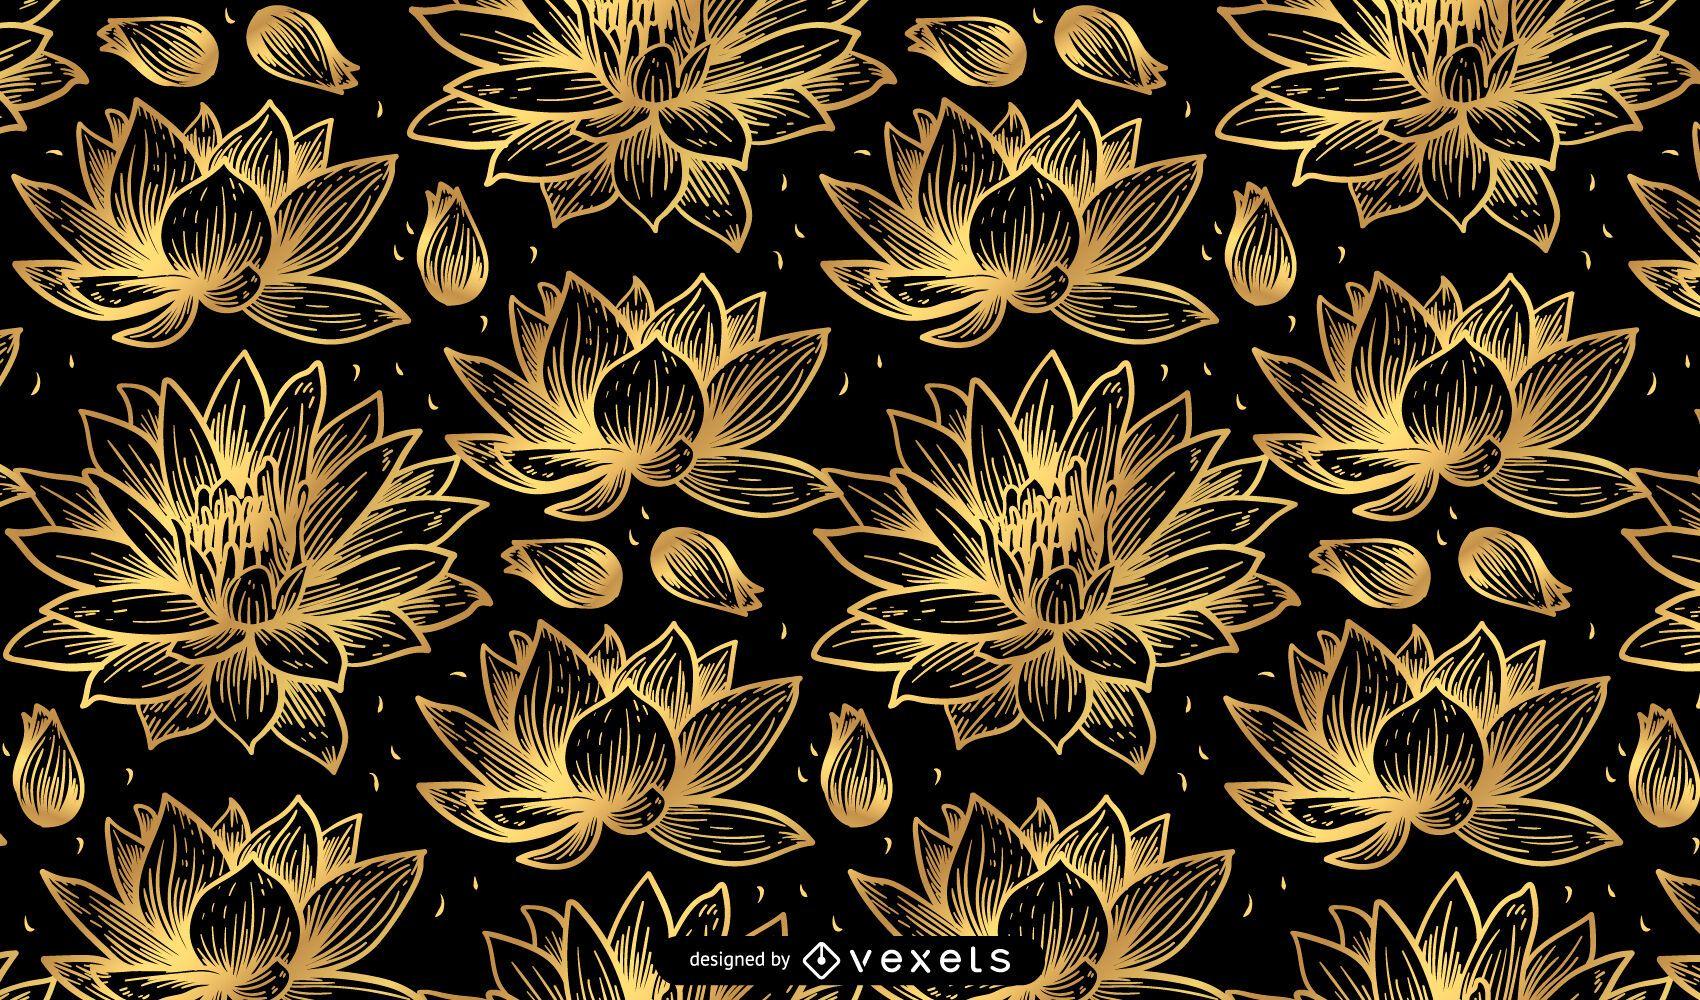 Golden lotus flower pattern design